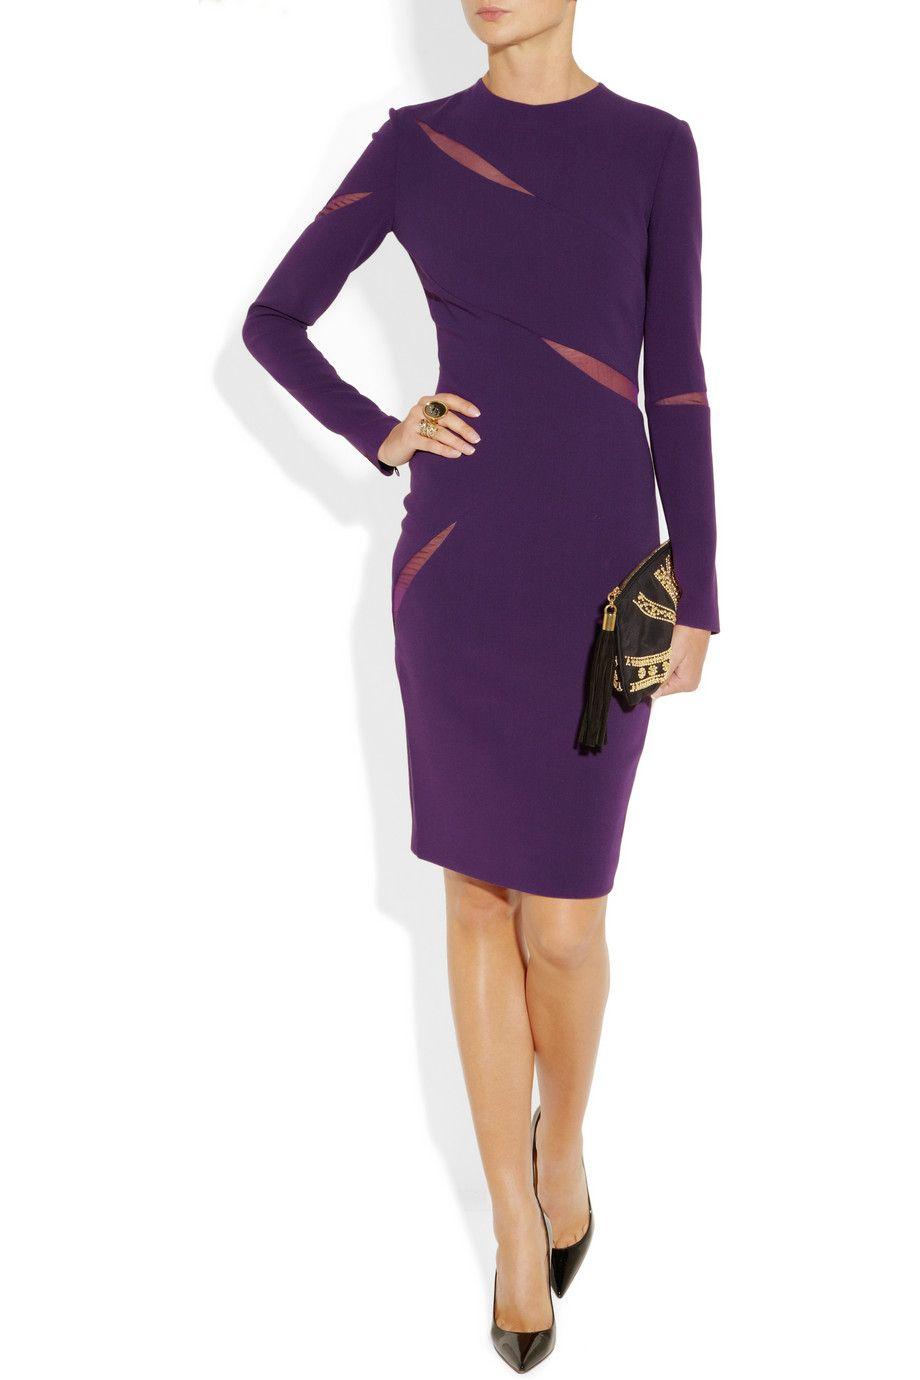 Emilio Pucci|Mesh-paneled stretch wool-blend crepe dress